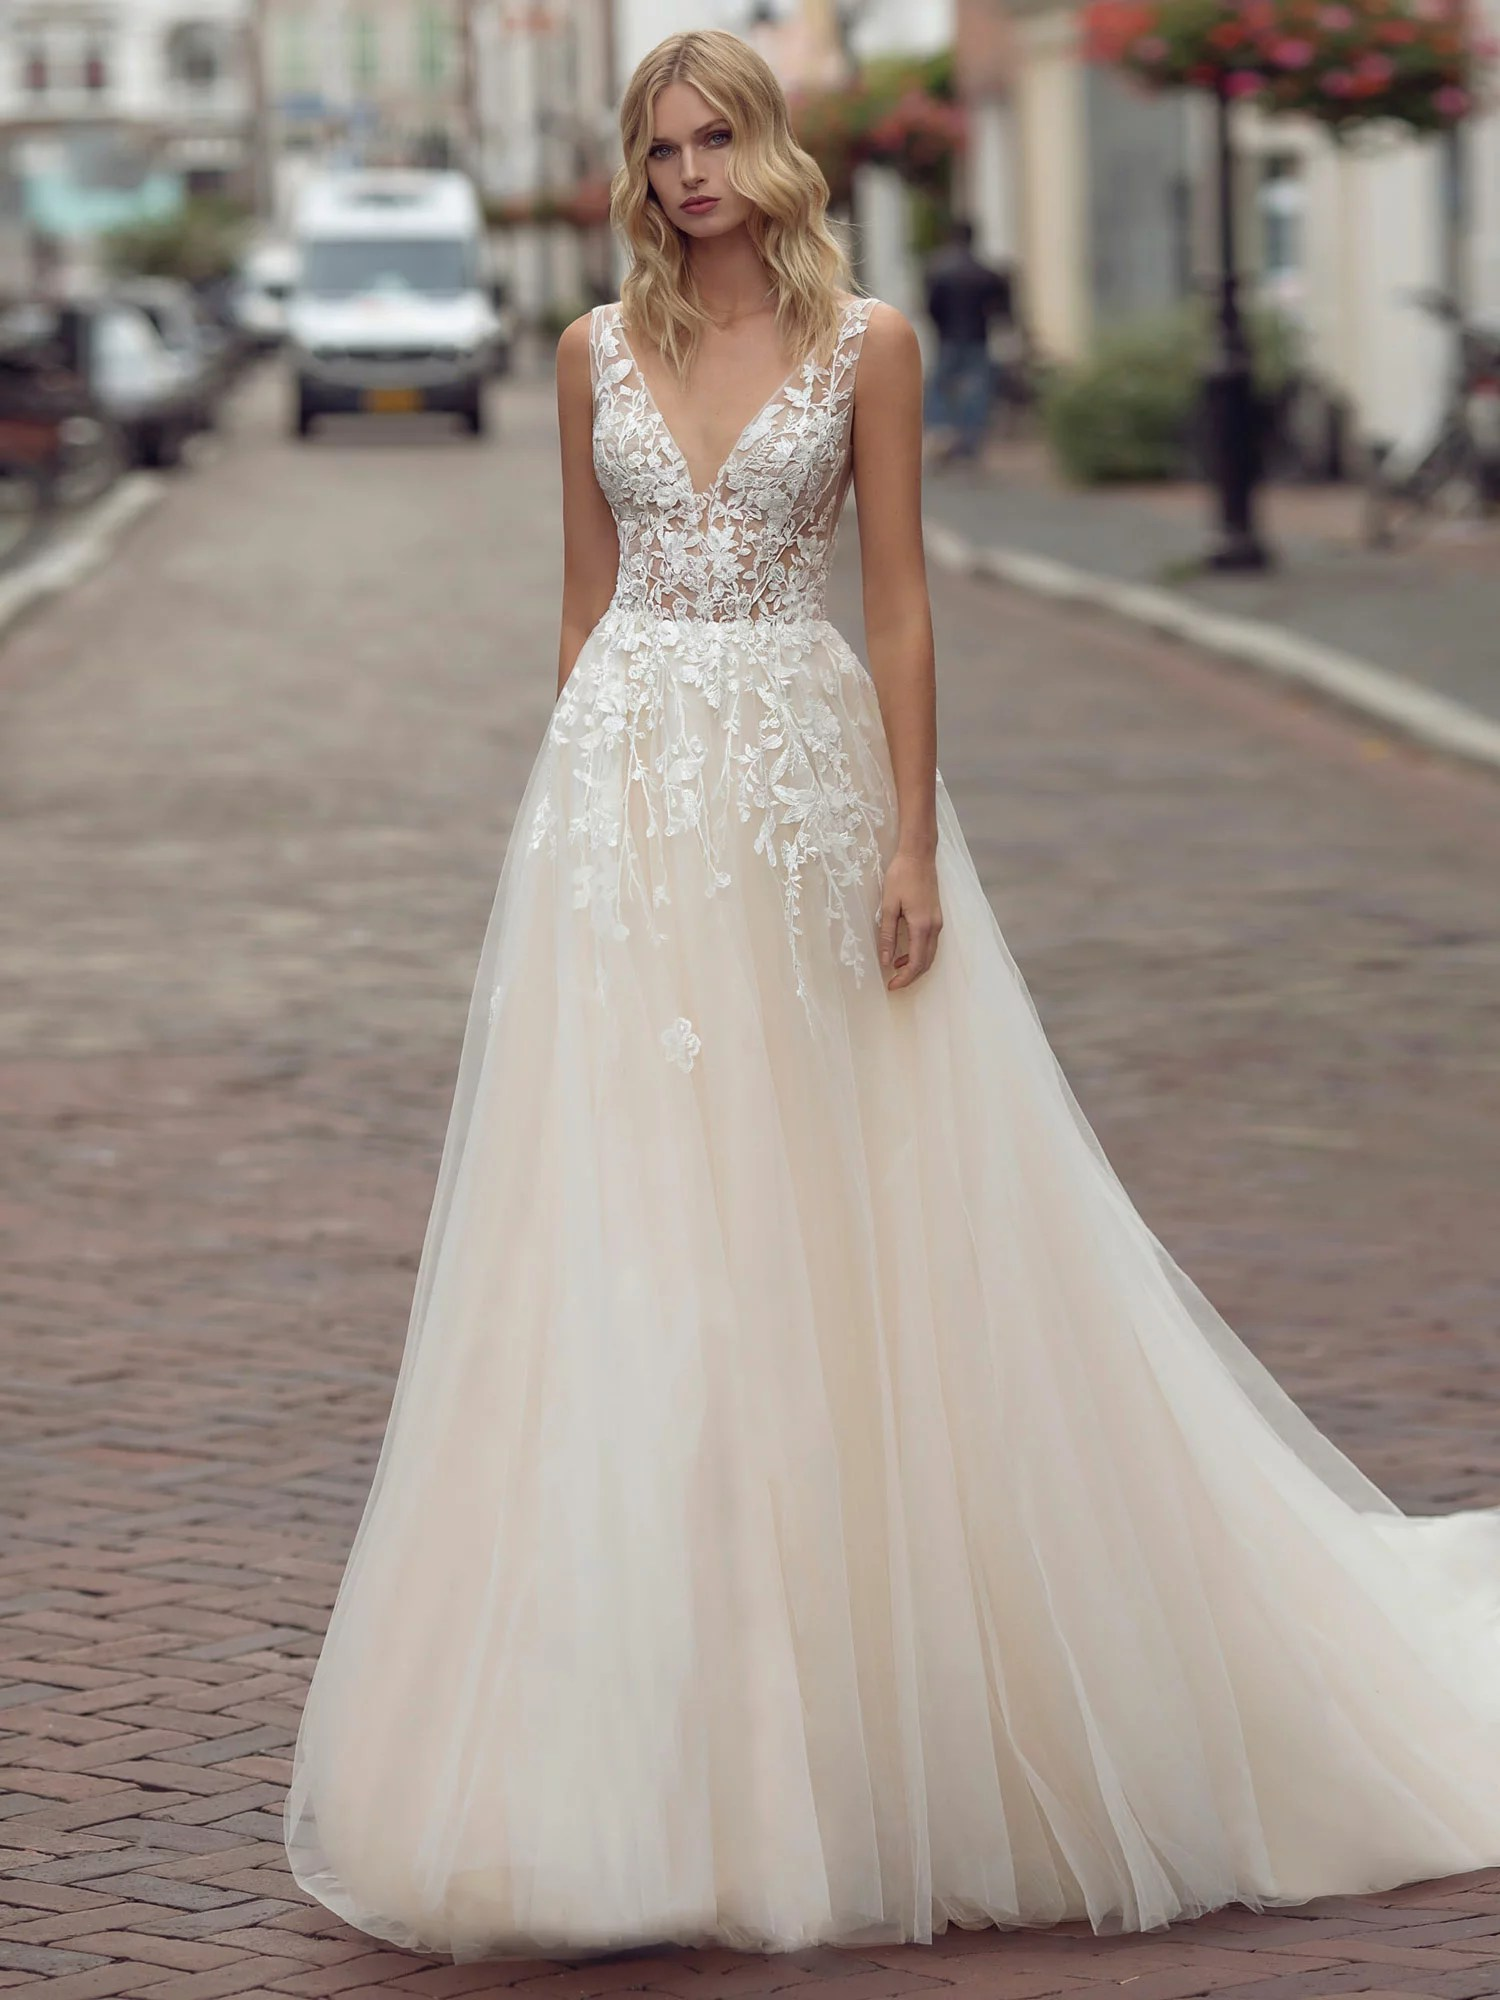 Robes de mariée princesse, volume - White